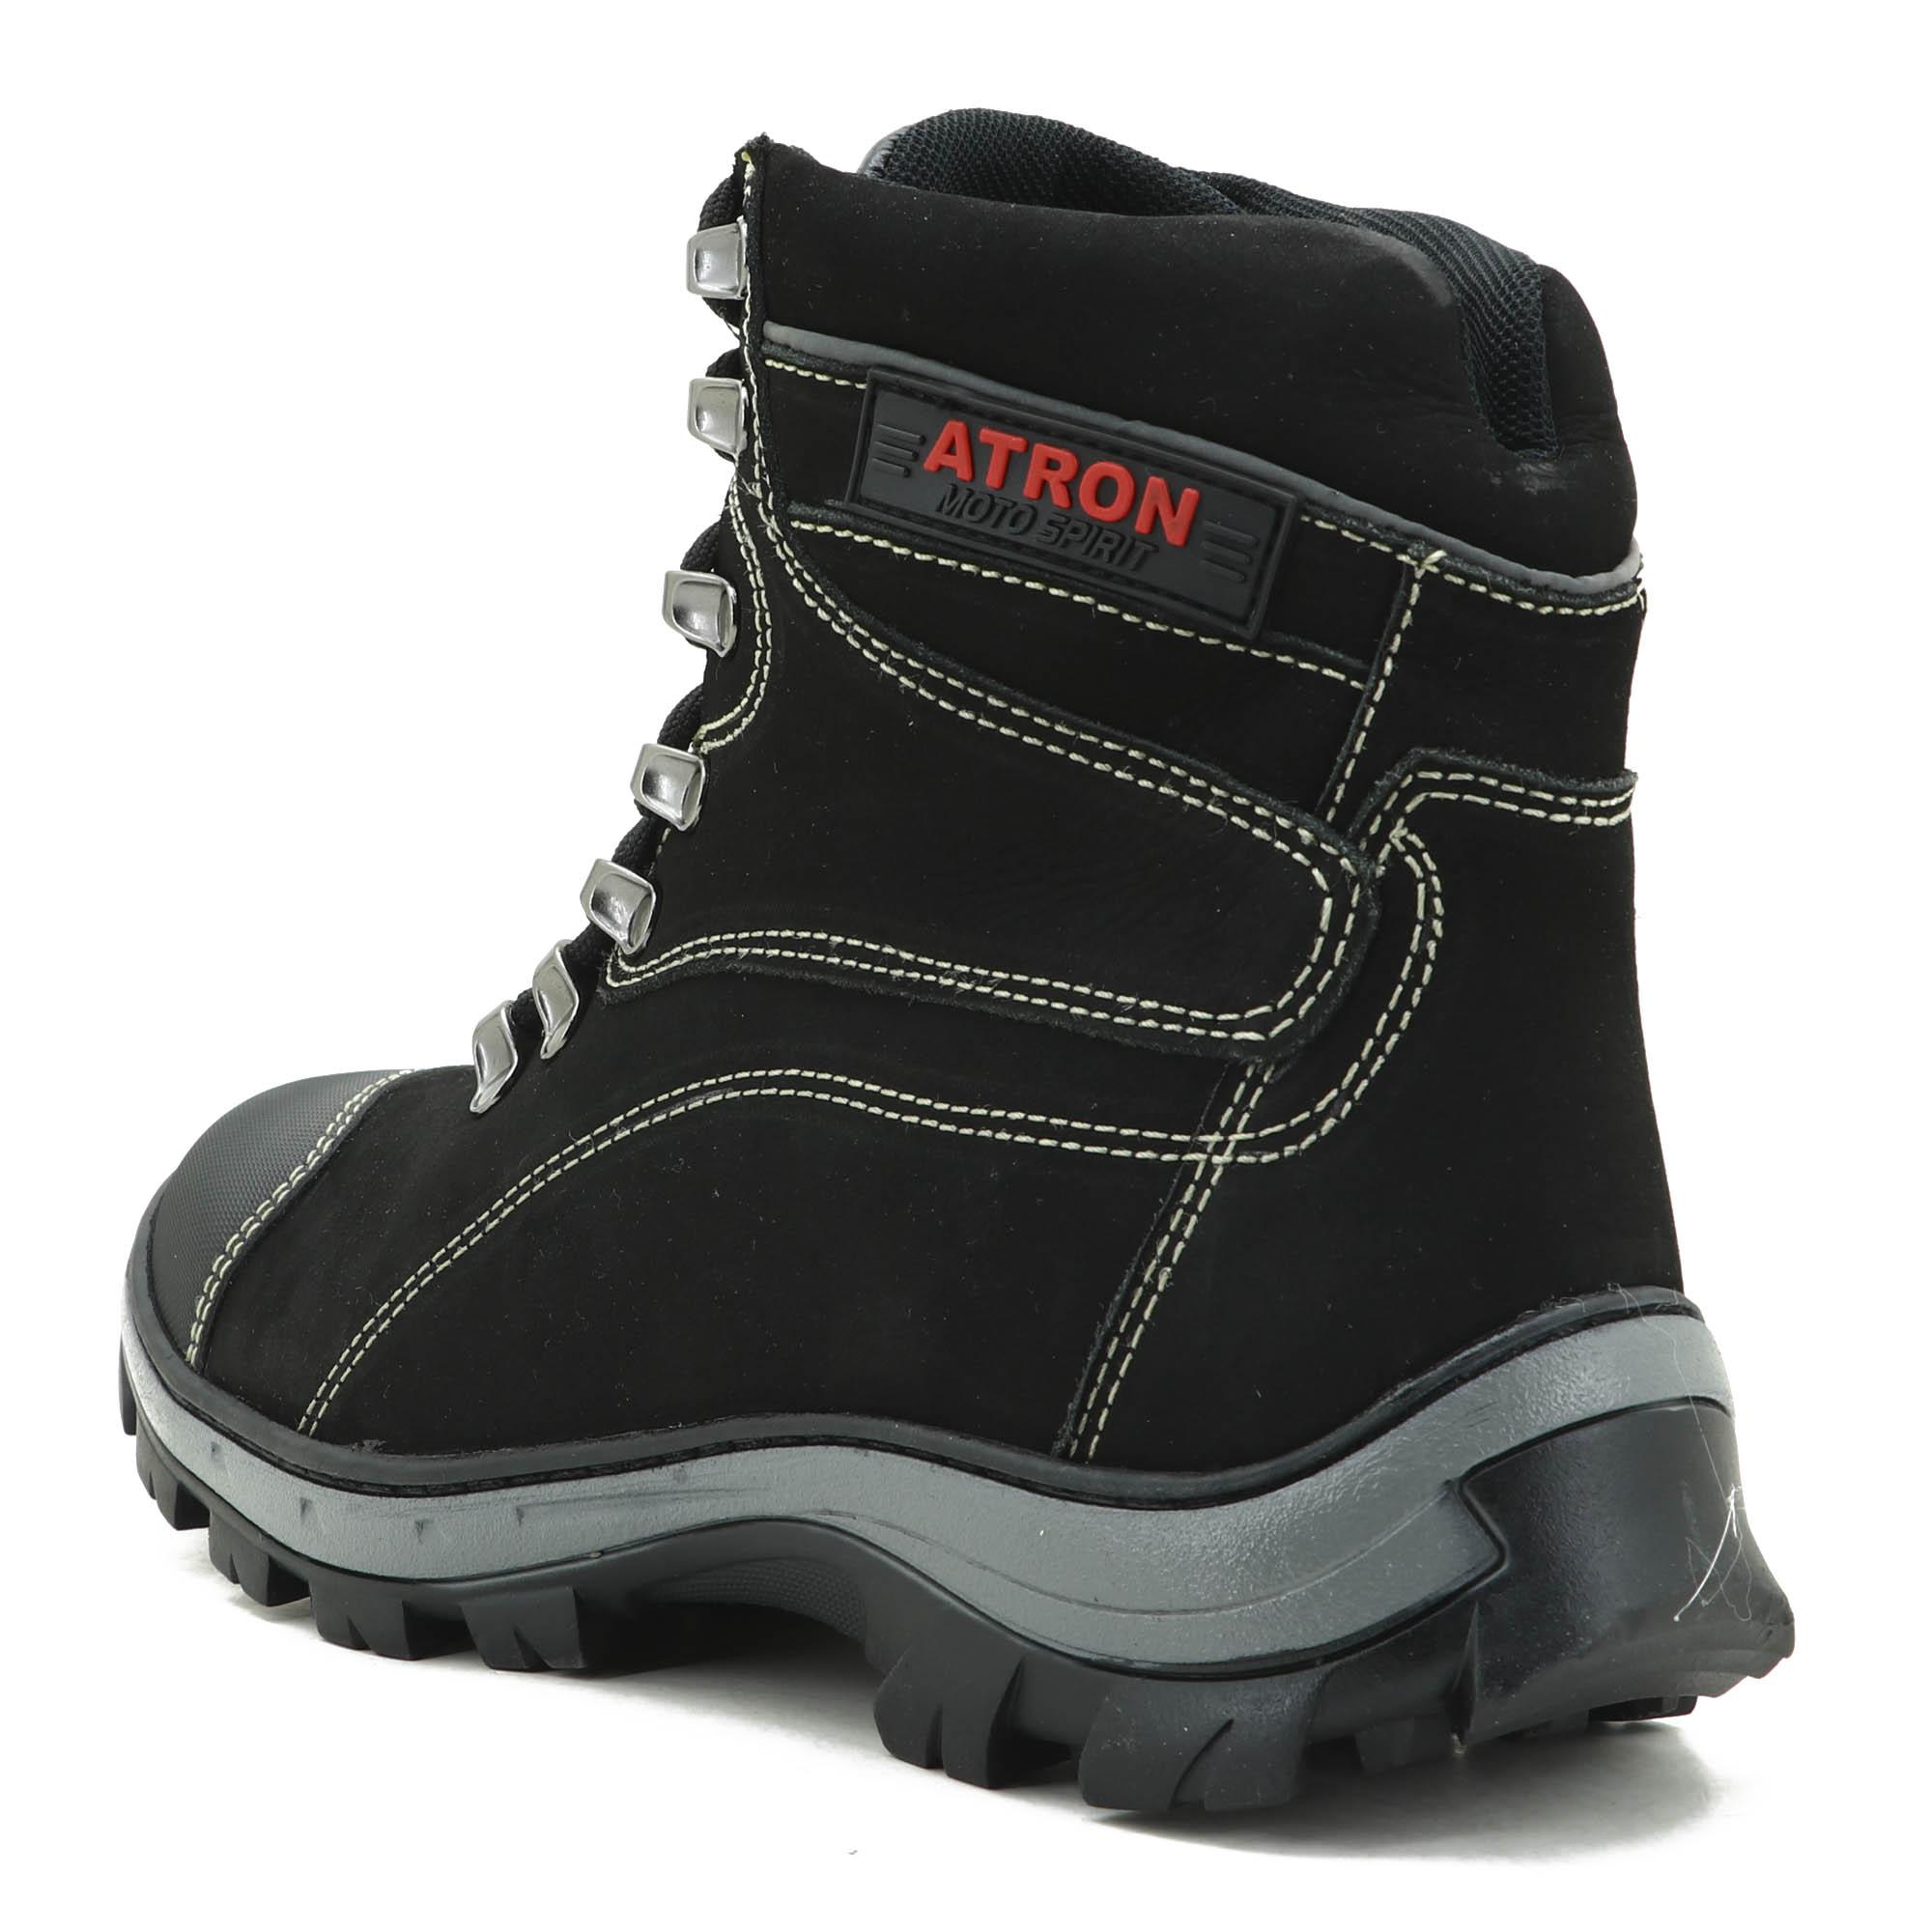 Coturno Adventure Trekking e trilha Atron Shoes na cor Preta 244 VALLENCE